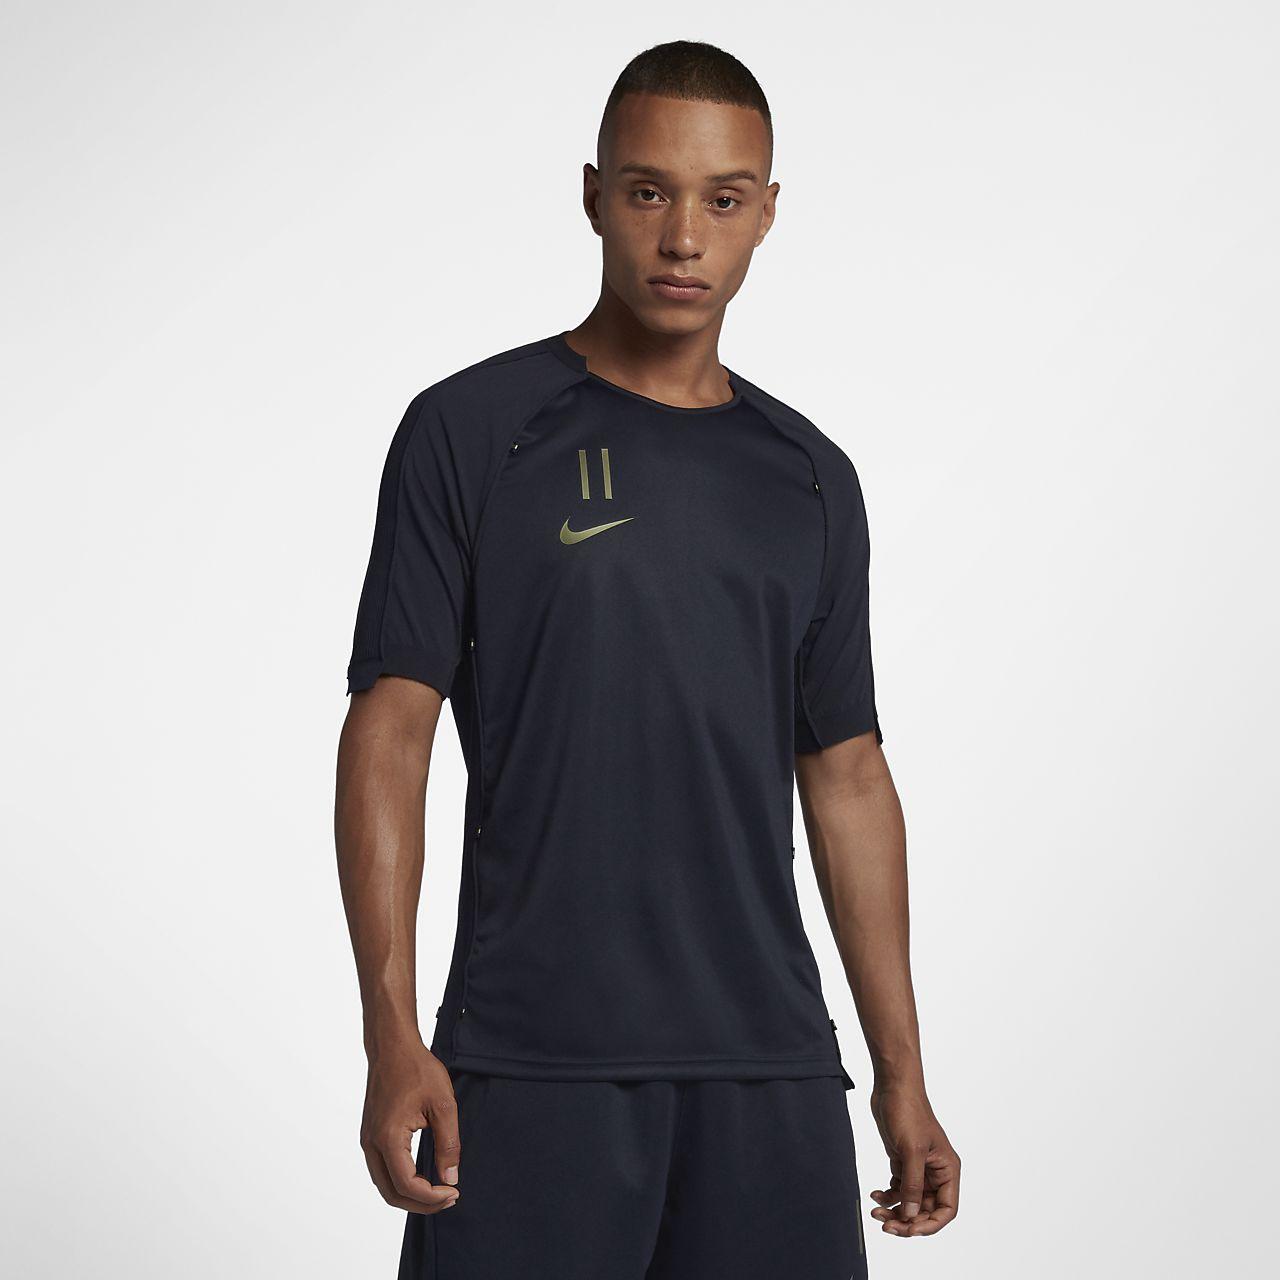 Nike x Kim Jones Men's Short-Sleeve Football Shirt